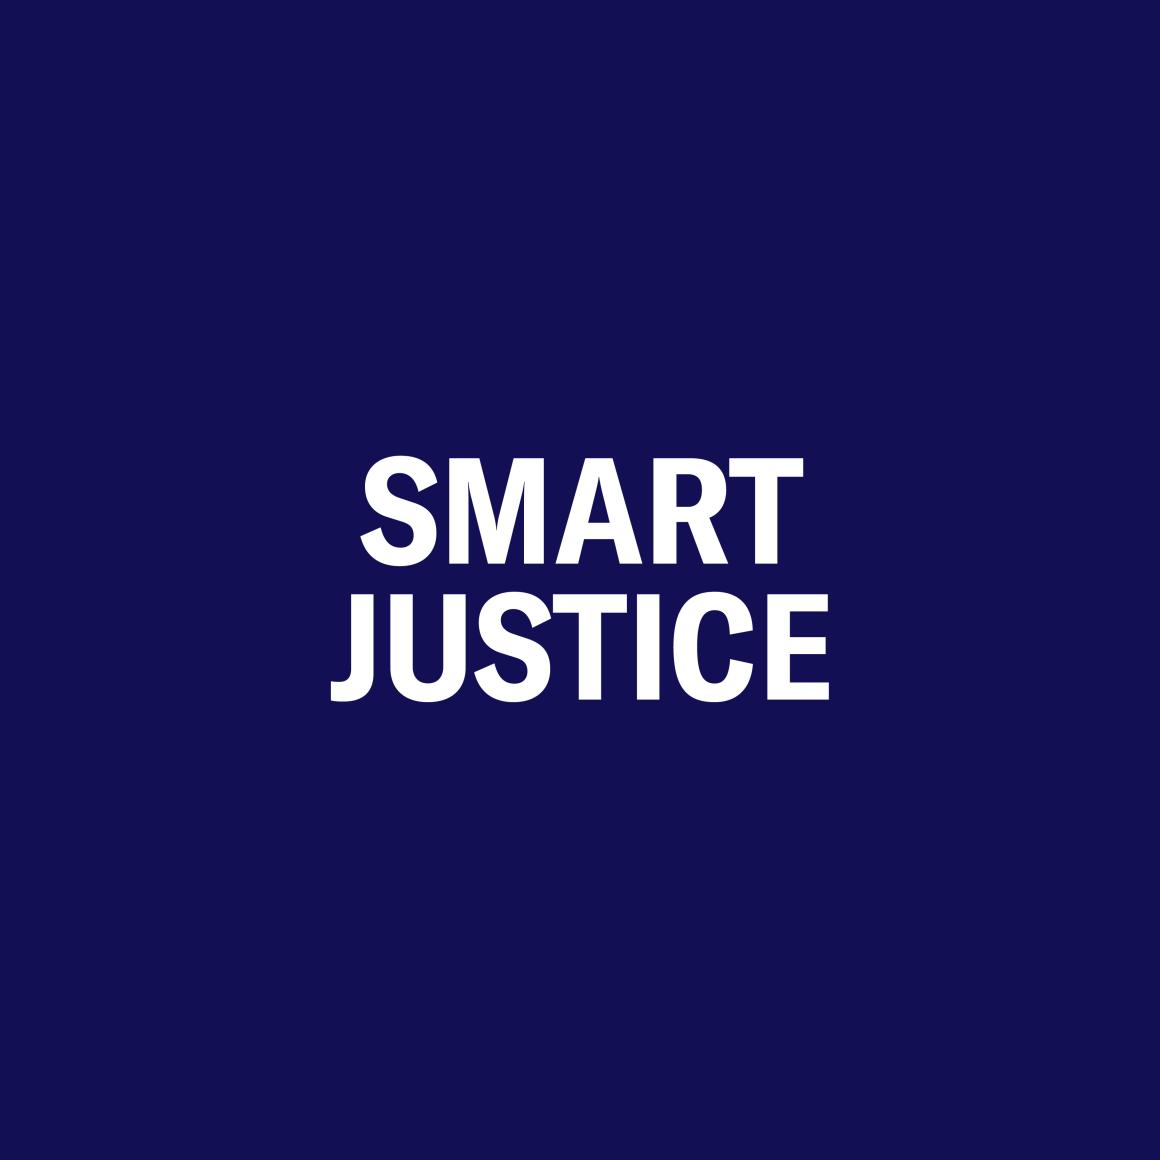 Smart Justice